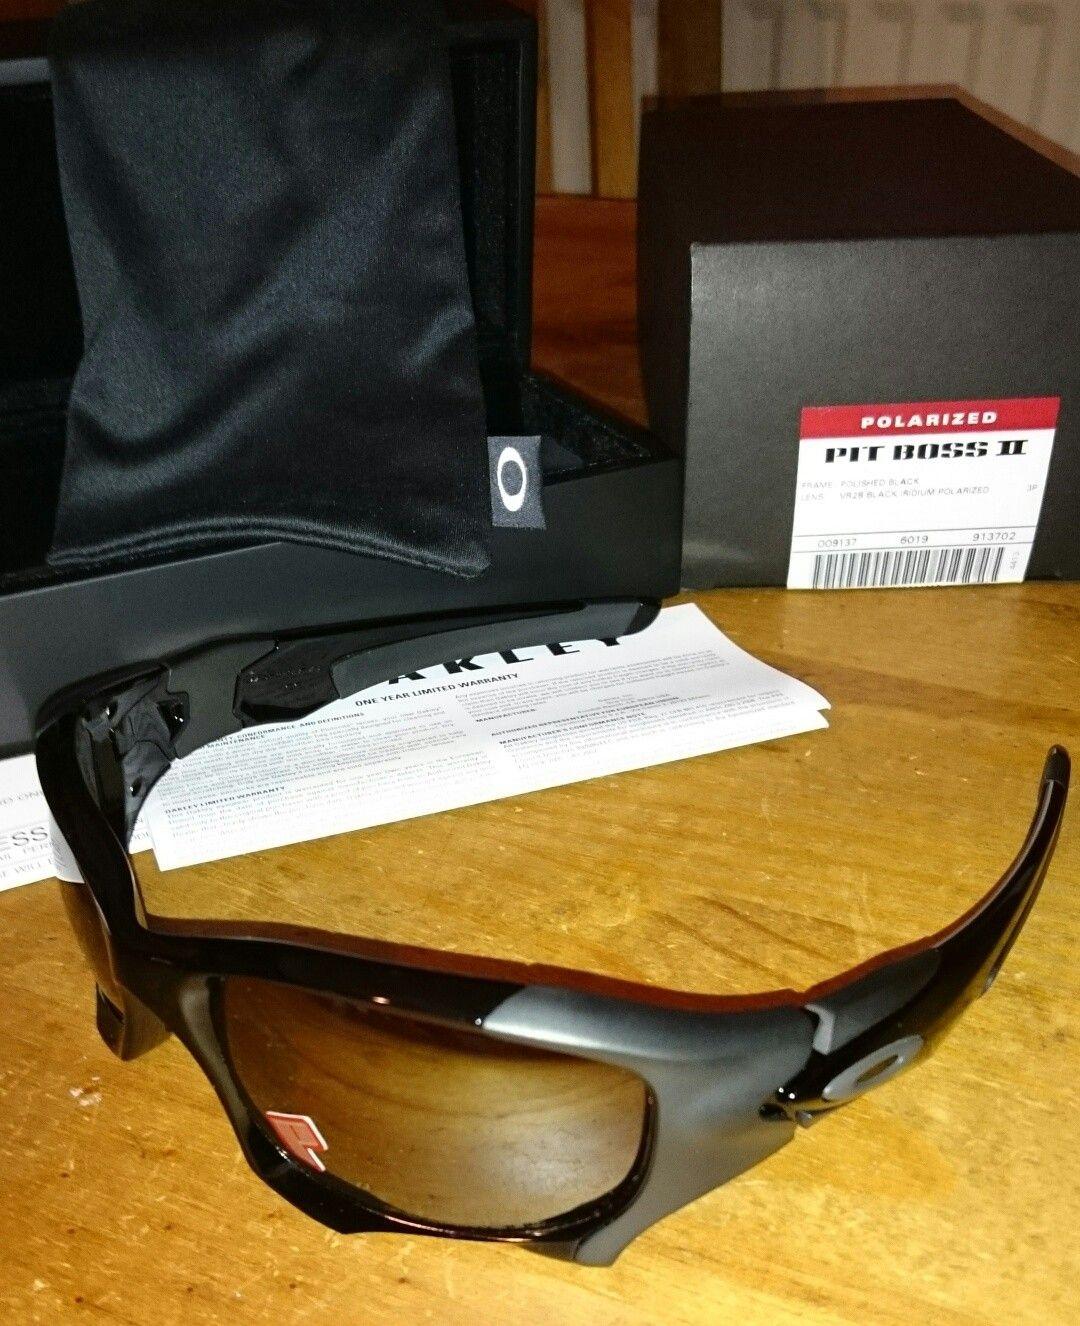 BNIB Pit Boss 2 - Polished Black with VR28 BIP - IMG_20150814_162613.JPG